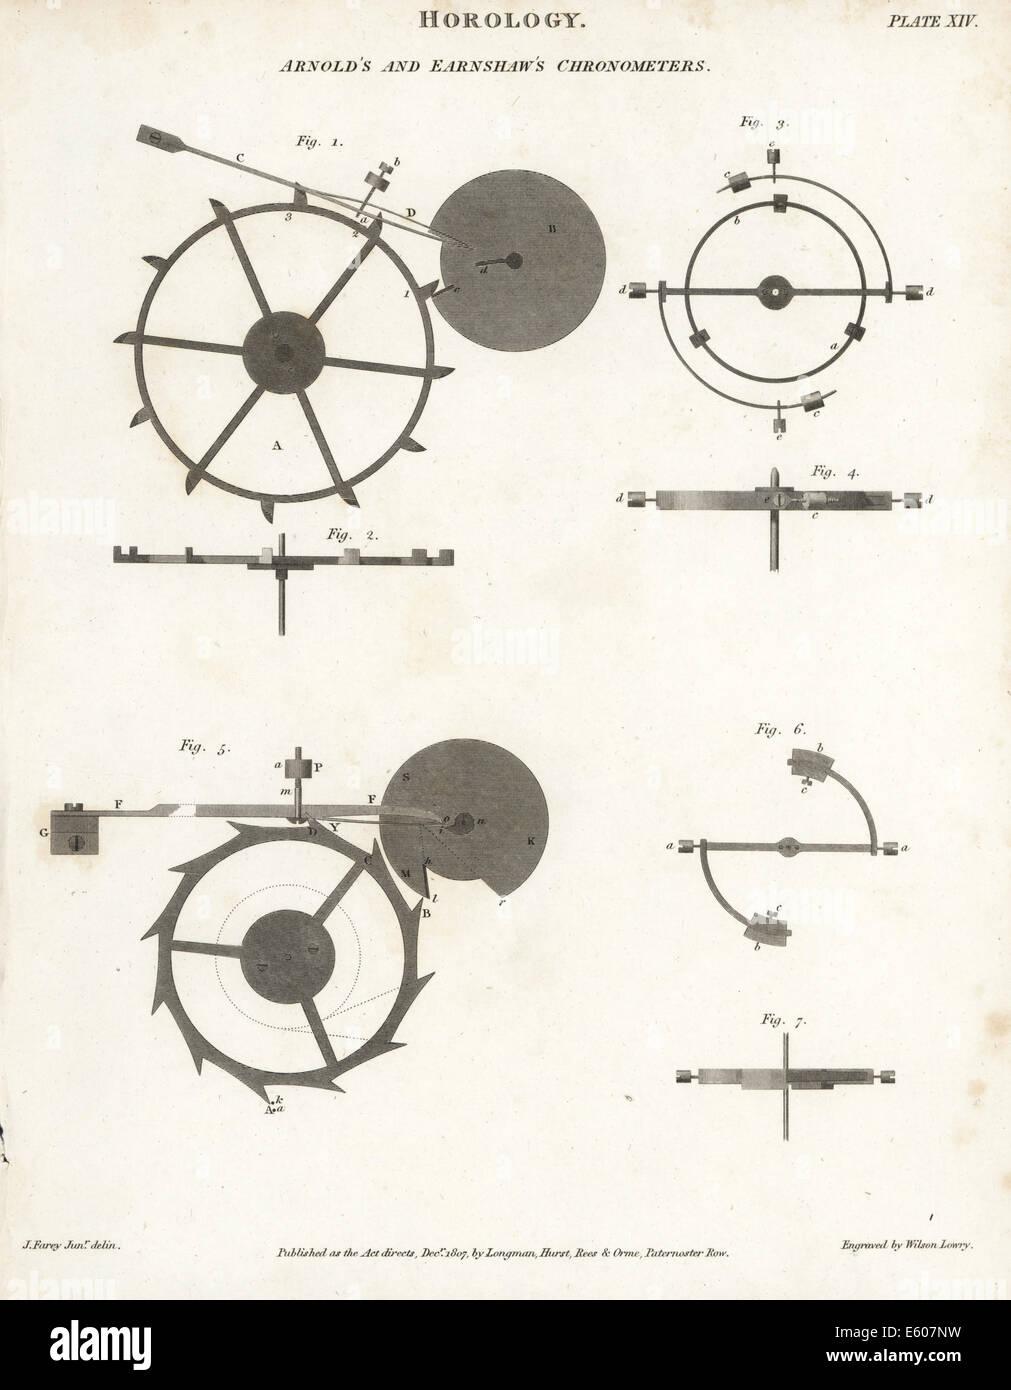 John Arnold's chronometer and Thomas Earnshaw's chronometer. - Stock Image